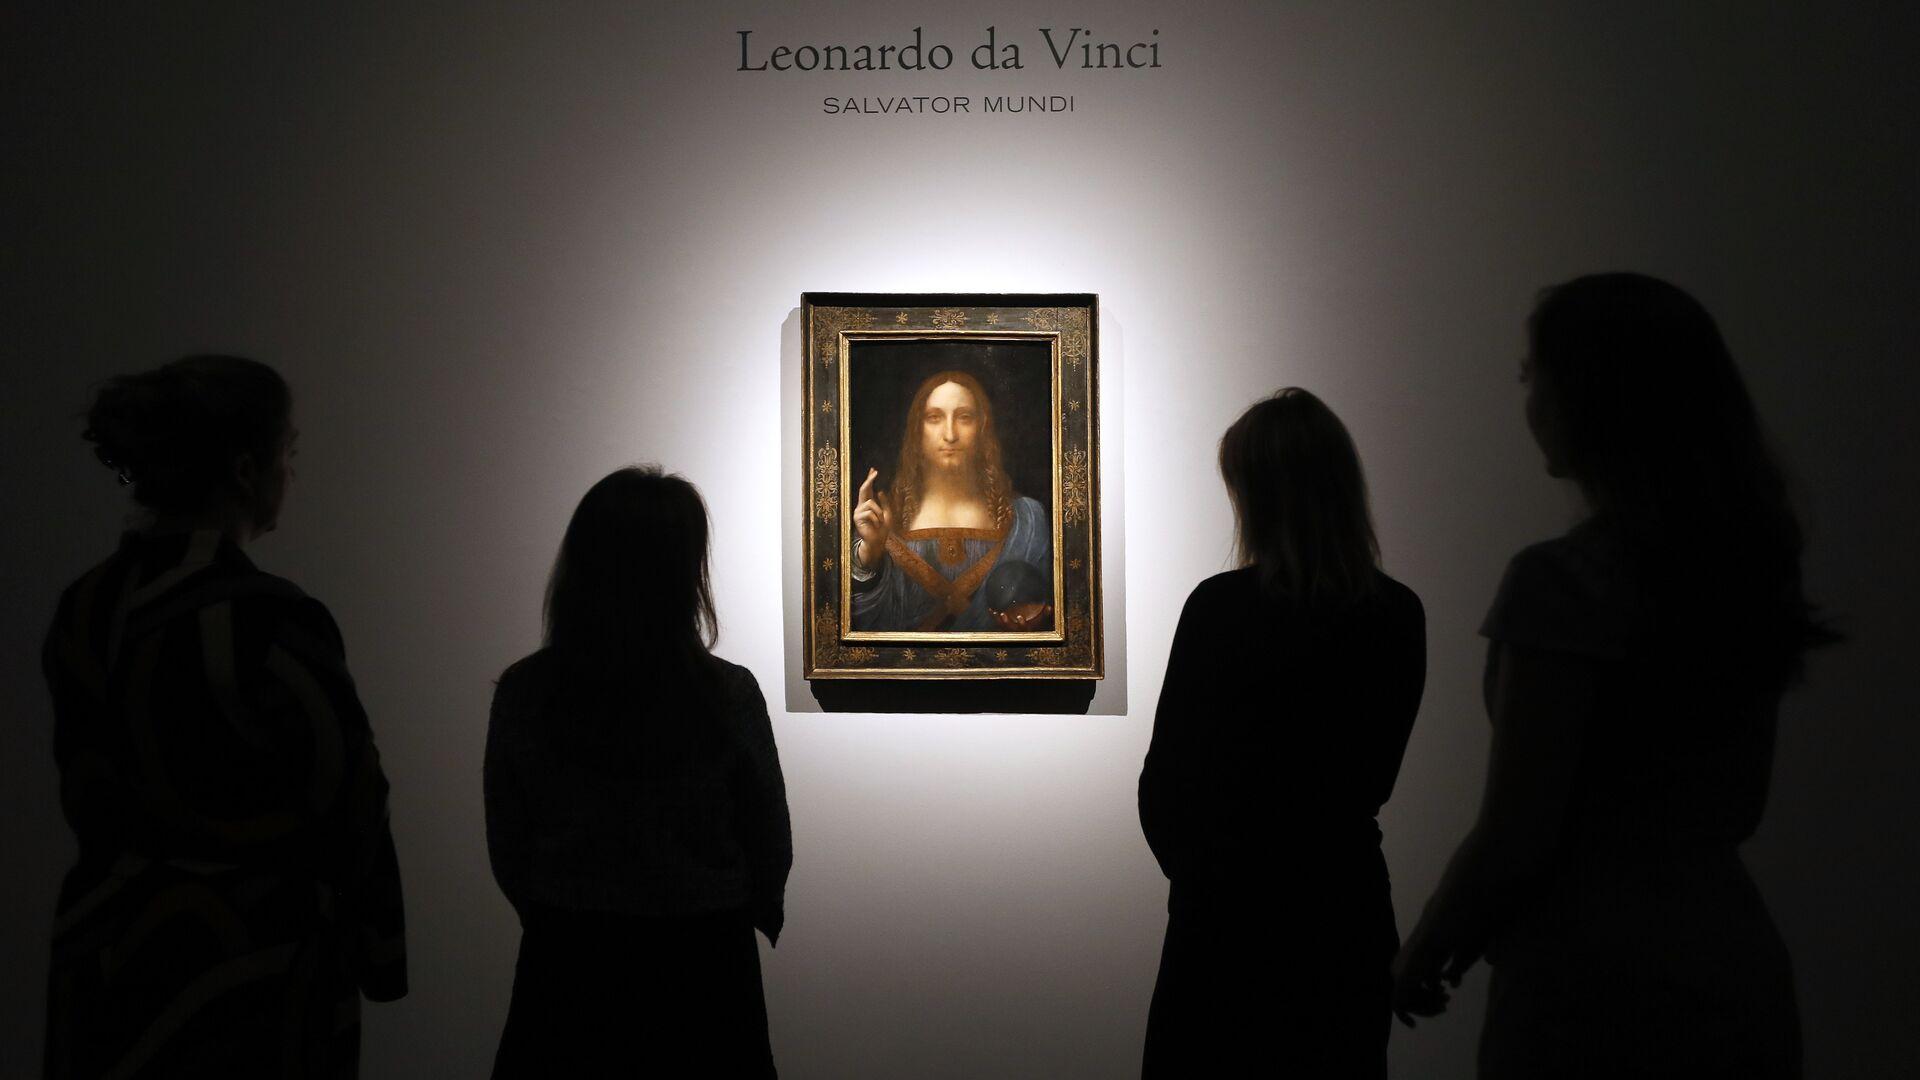 Картина Леонардо да Винчи Спаситель мира на аукционе Christie's в Лондоне. 24 октября 2017 - РИА Новости, 1920, 07.01.2020